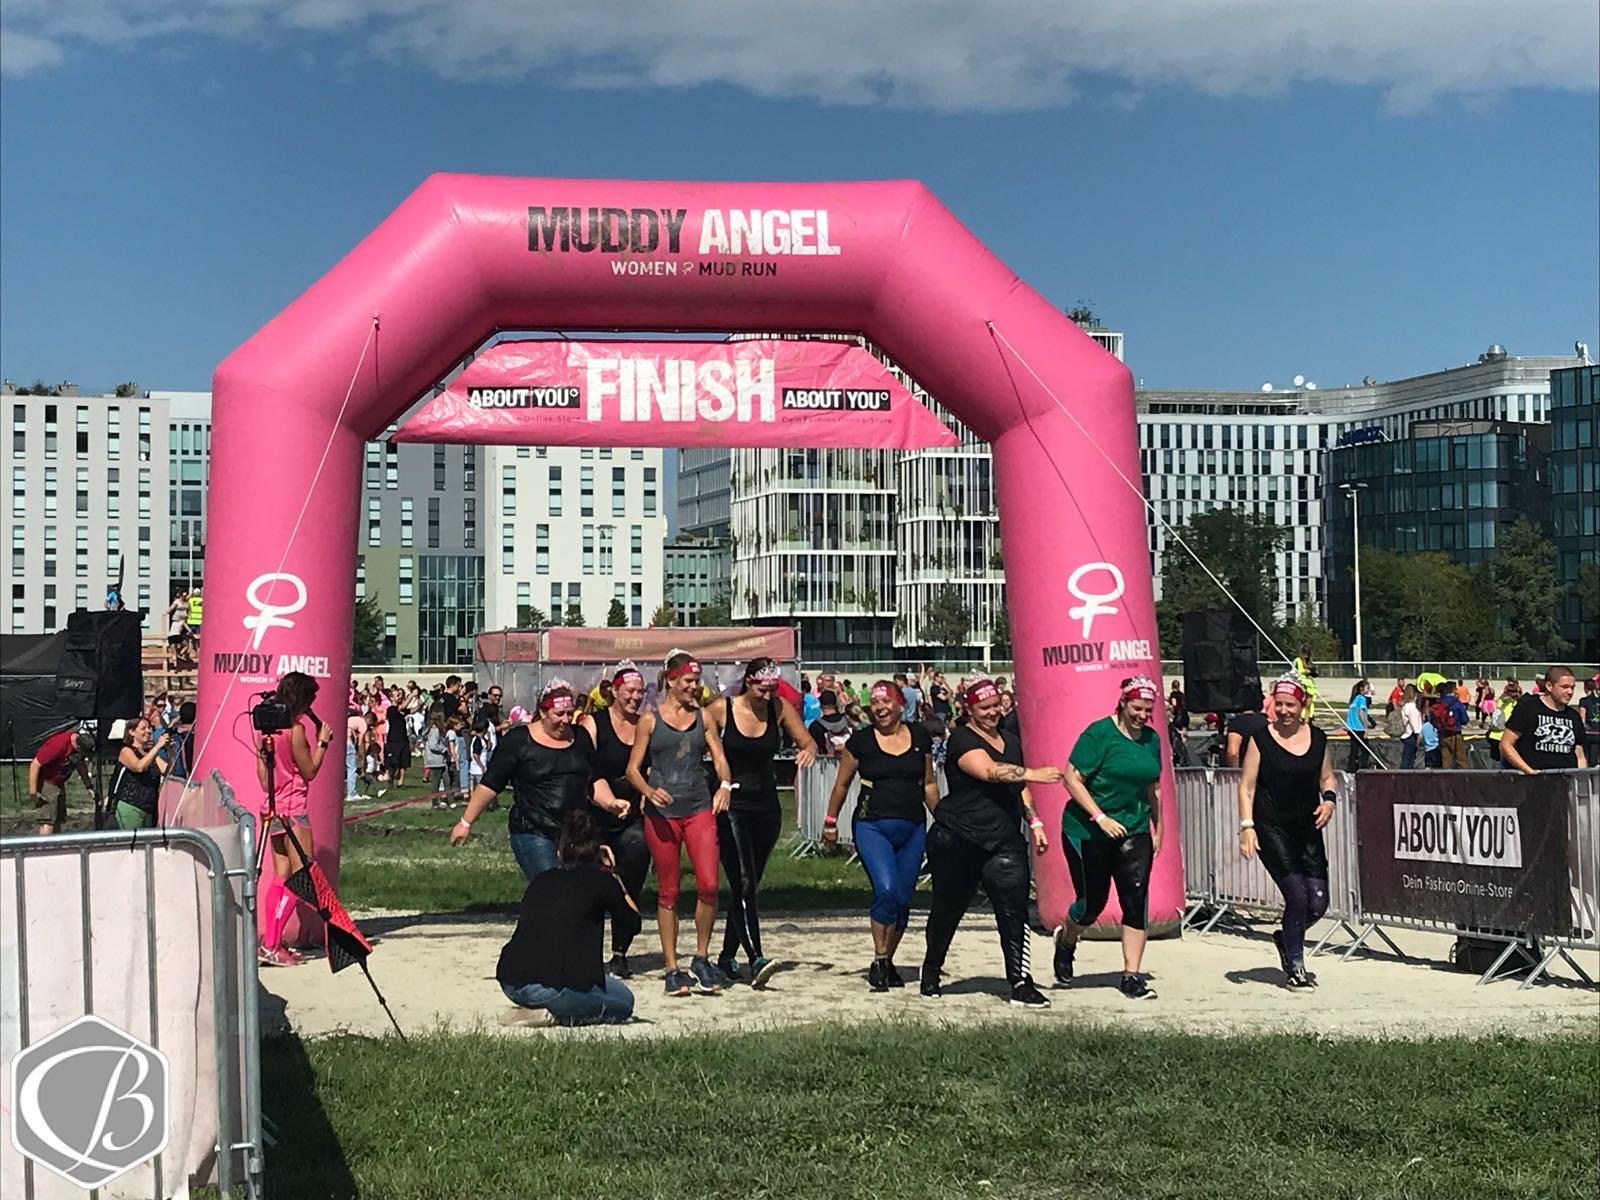 Angel Muddy Run 2018 - Fitness e!Motion